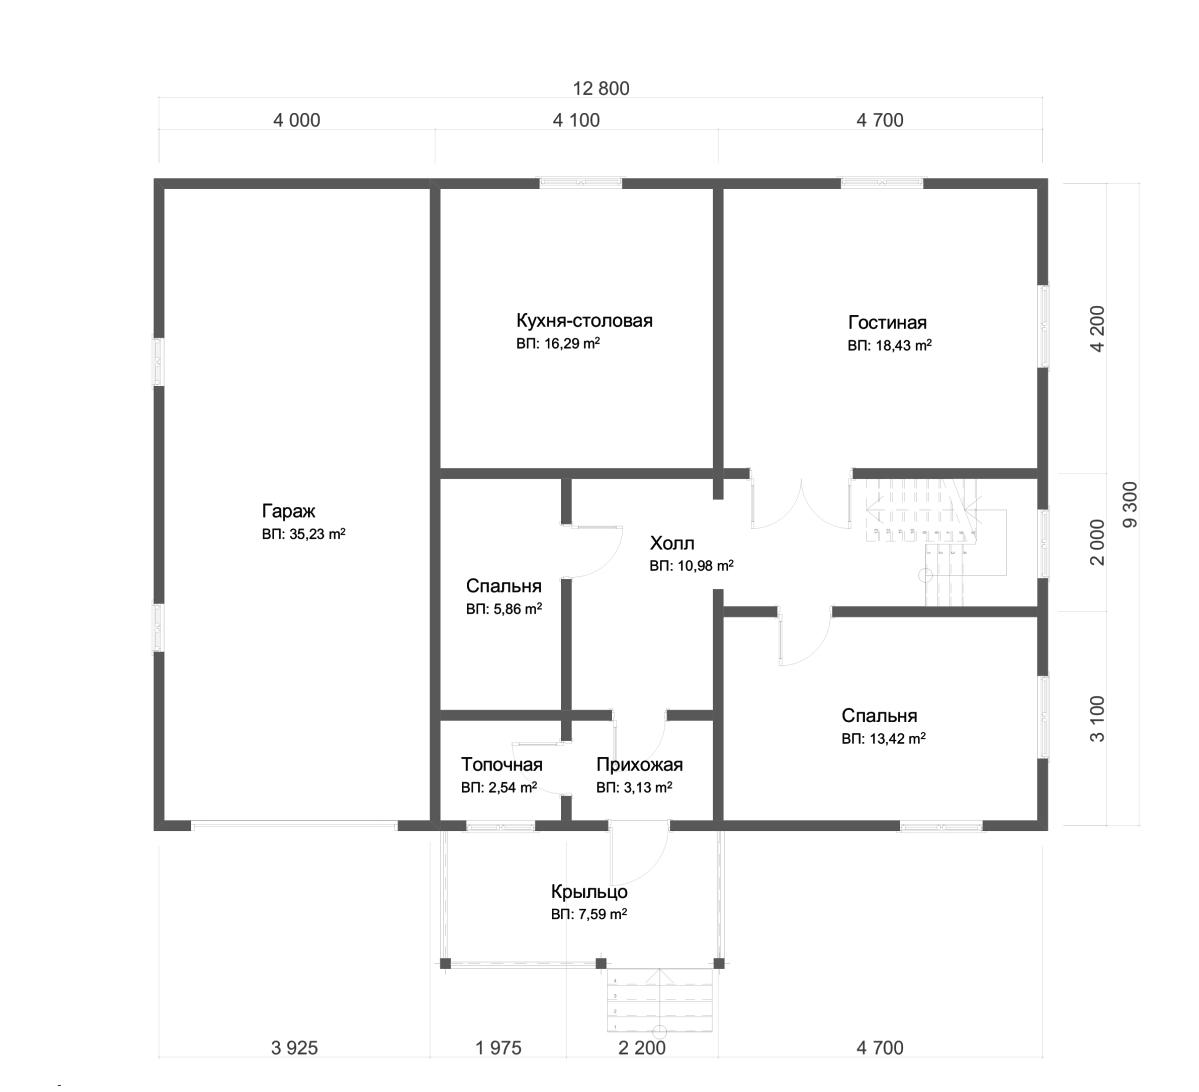 Проект дома из бруса 9,3х12,8 1,5 этажа с гаражом. План 1-го этажа.